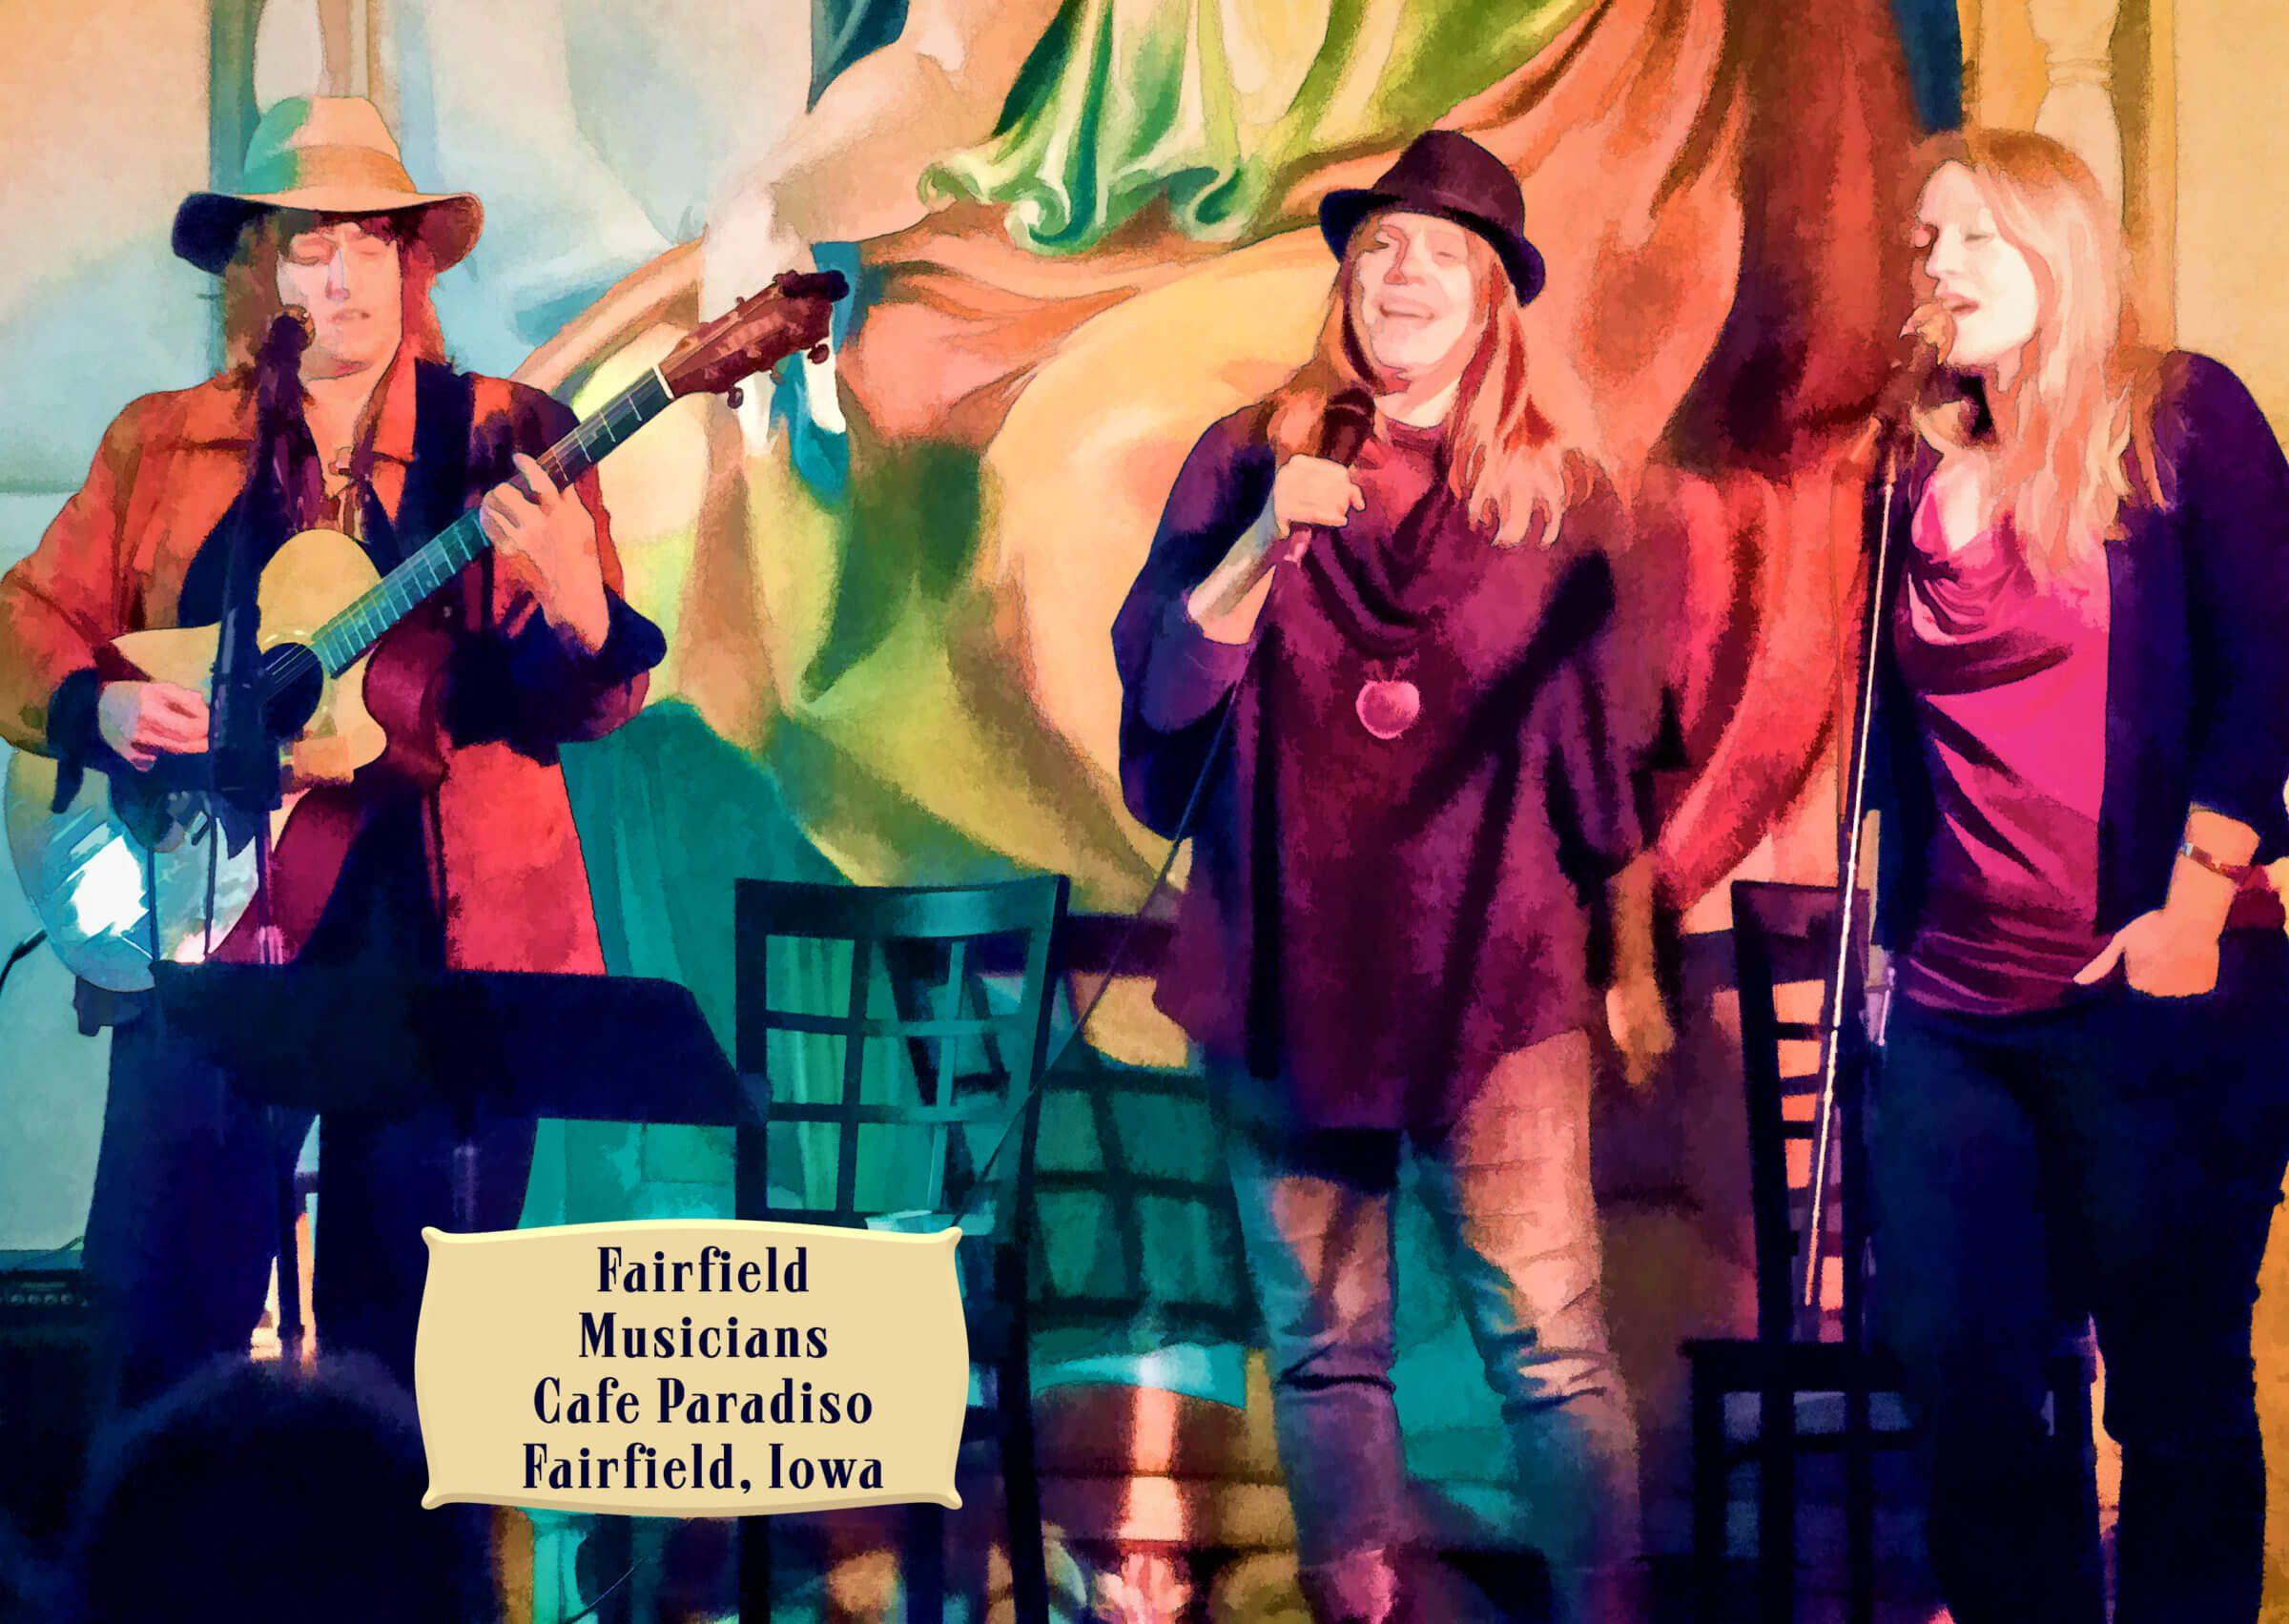 Fairfield Musicians Cafe Paradiso Fairfield, Iowa